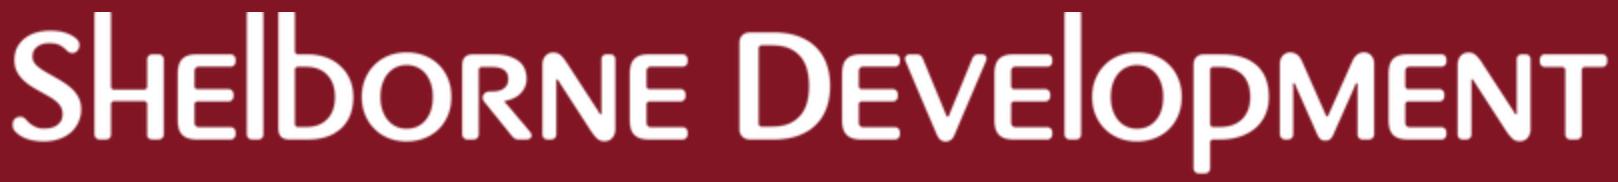 shelborne logo